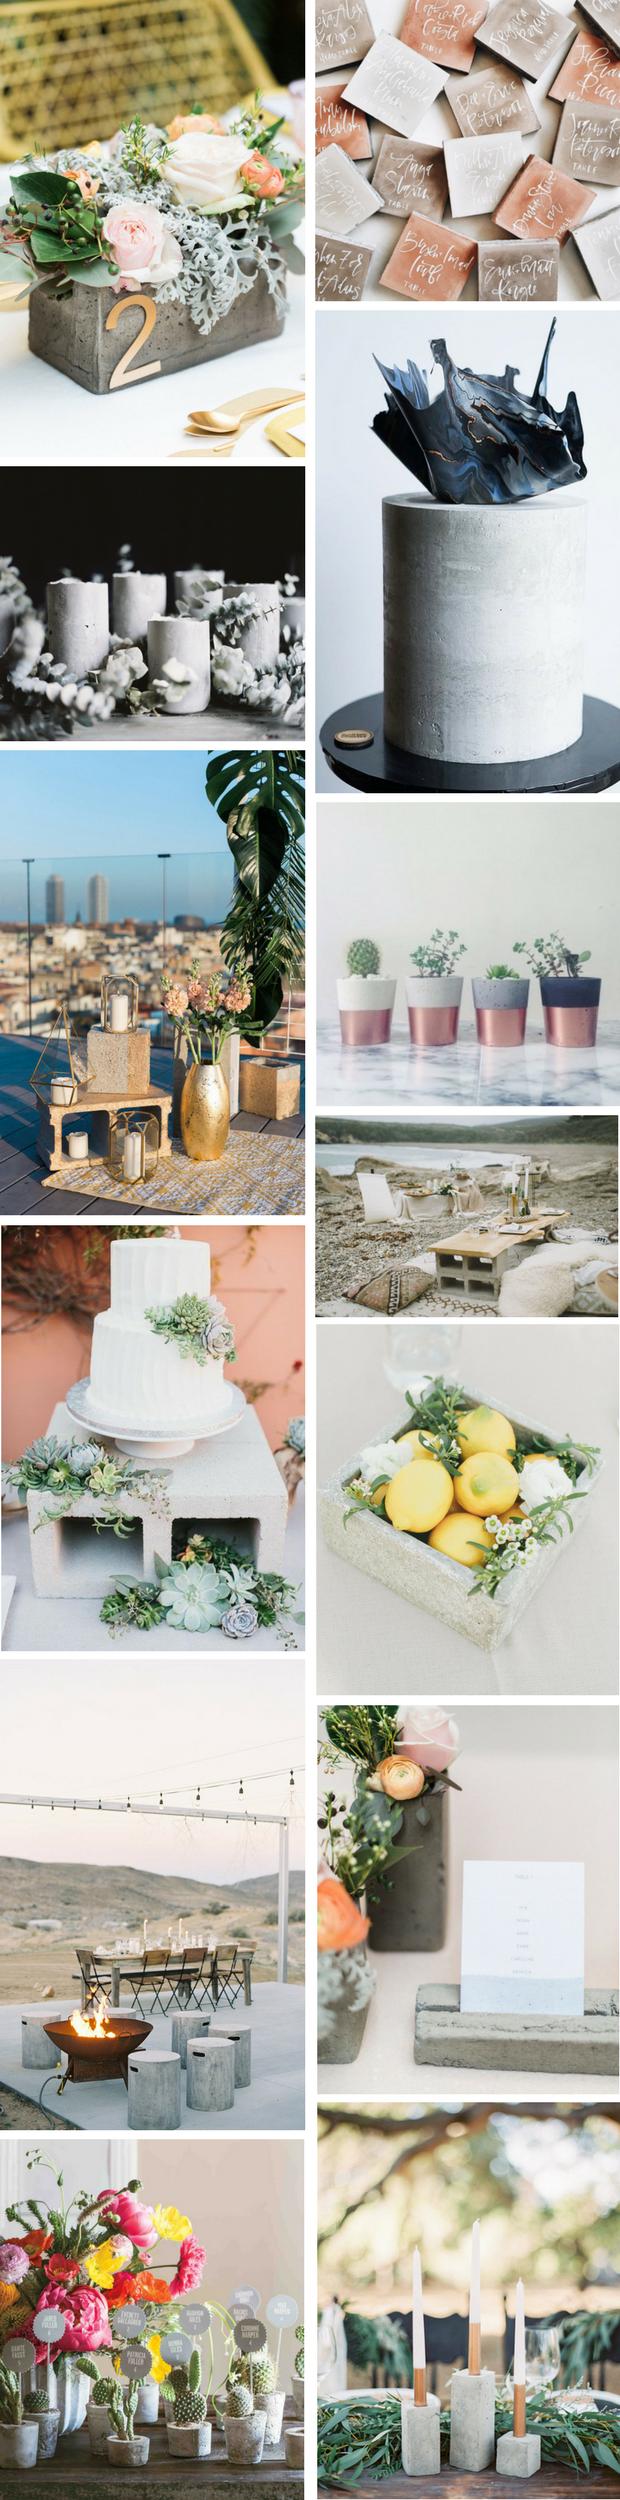 Wedding theme ideas by color  Stark Style Concrete Wedding Decor in   My Best Friendus